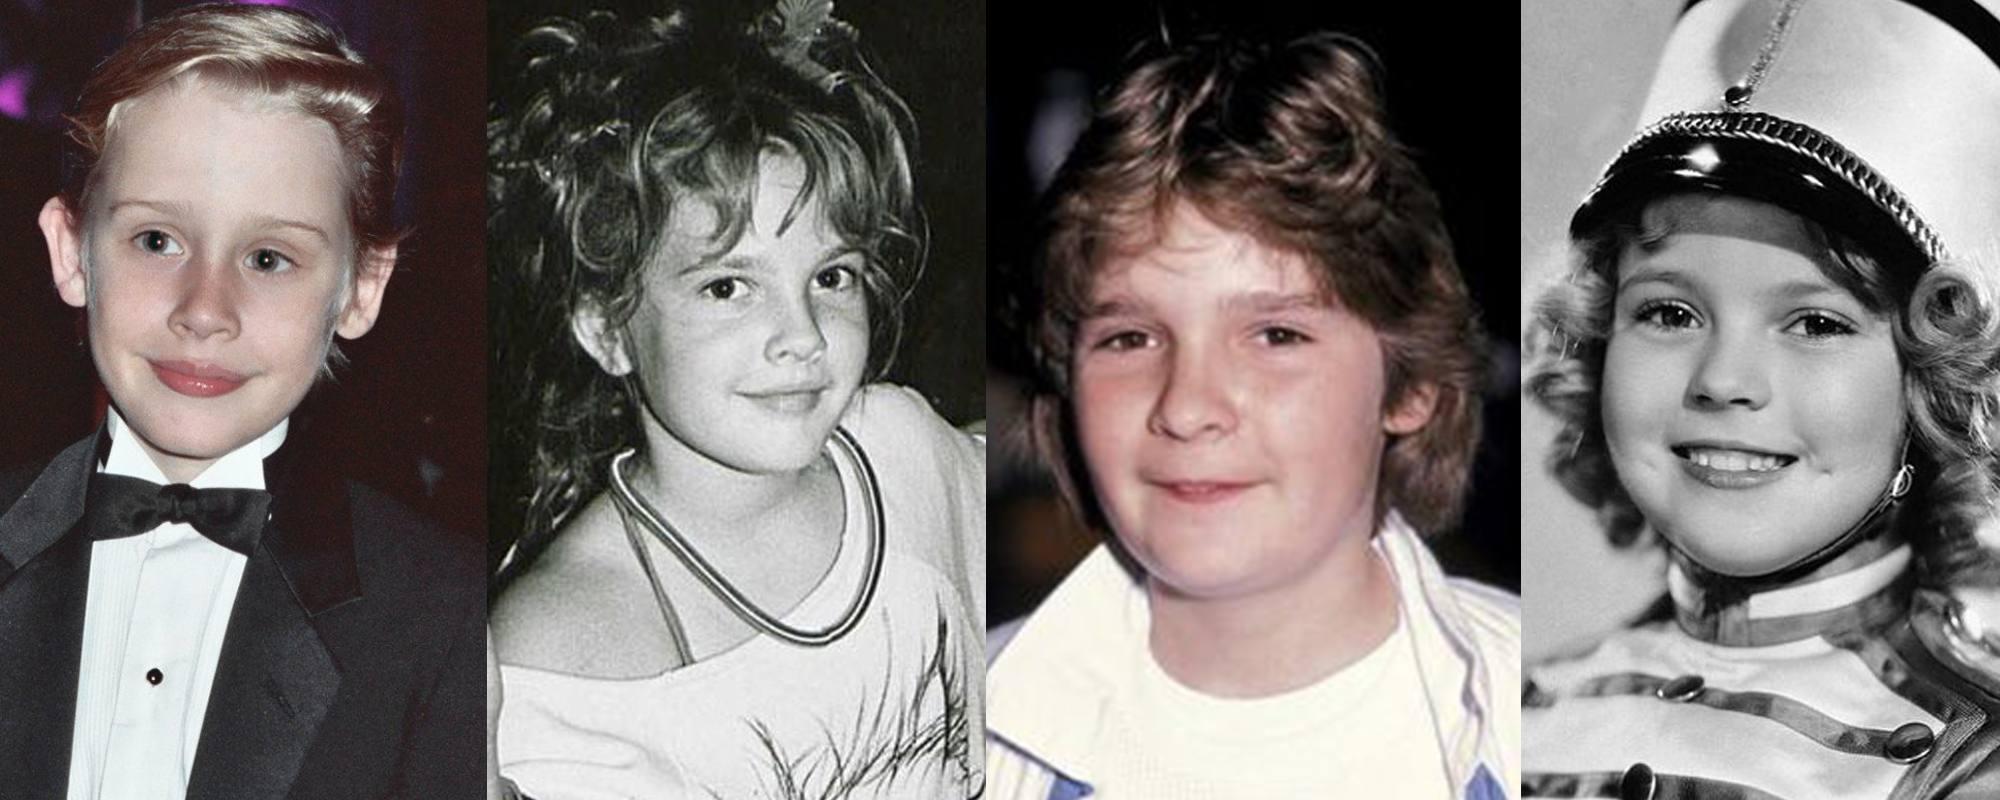 Child Actors Featured